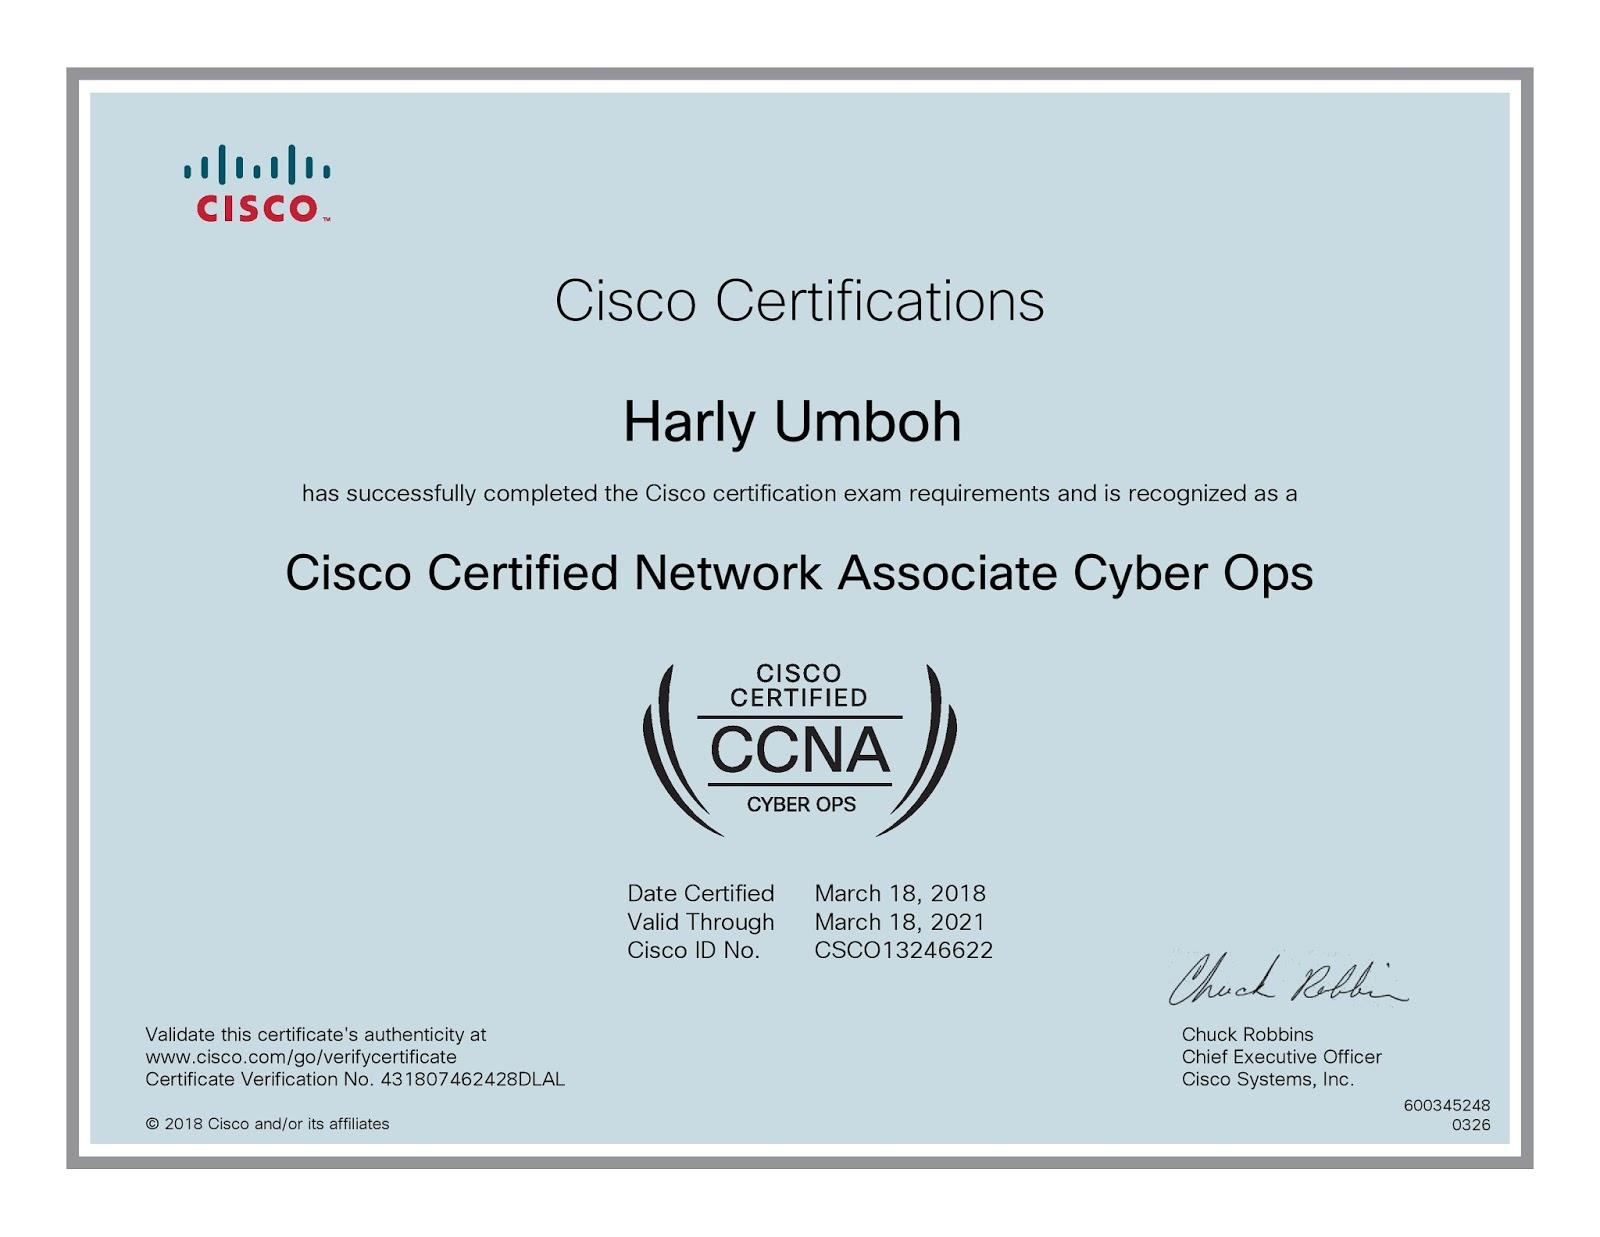 HARLY UMBOH: Lulus Sertifikasi CCNA Cyber Ops